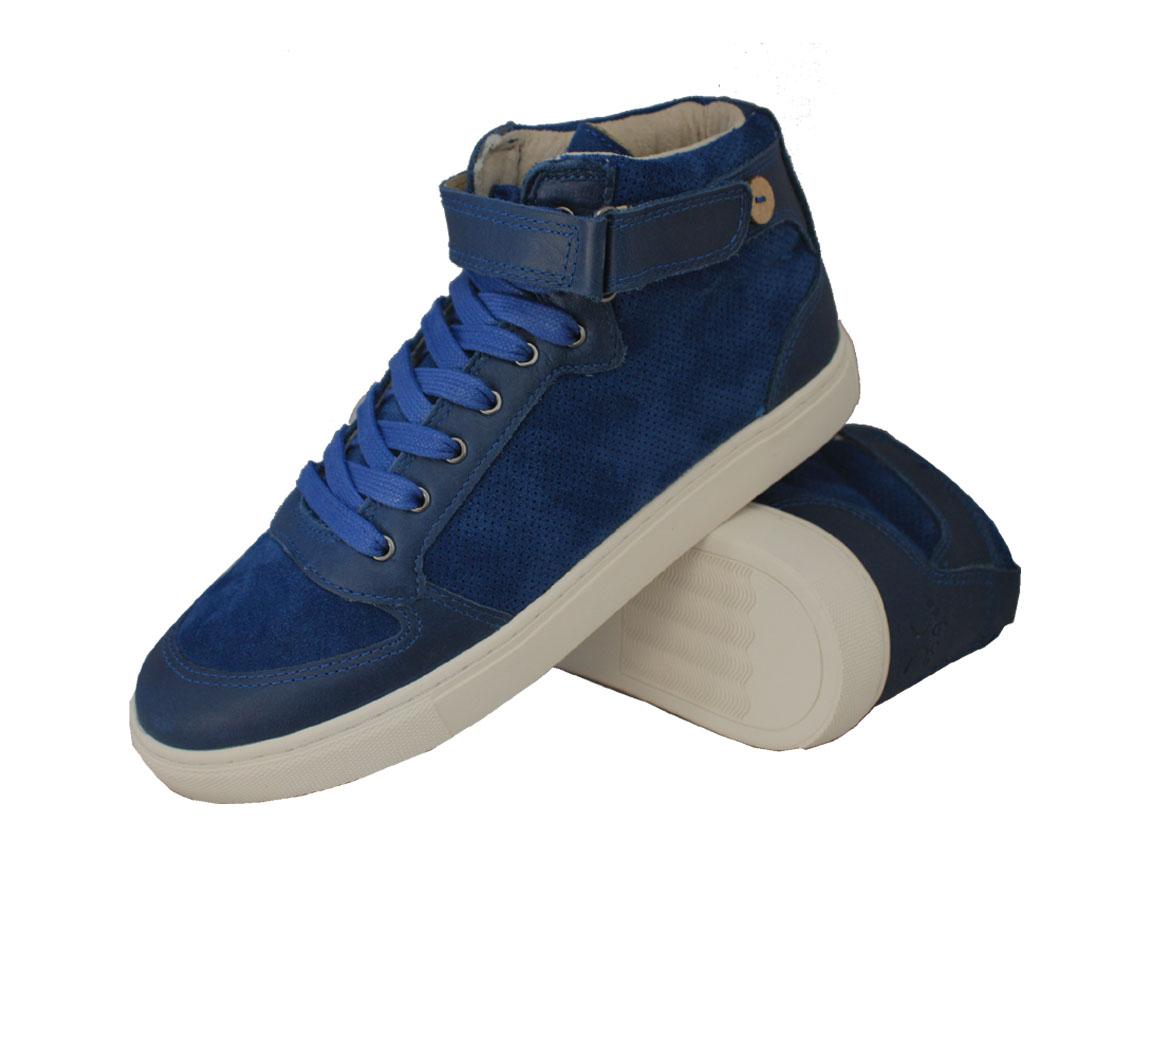 Chaussure homme Dogwood Ultramarine